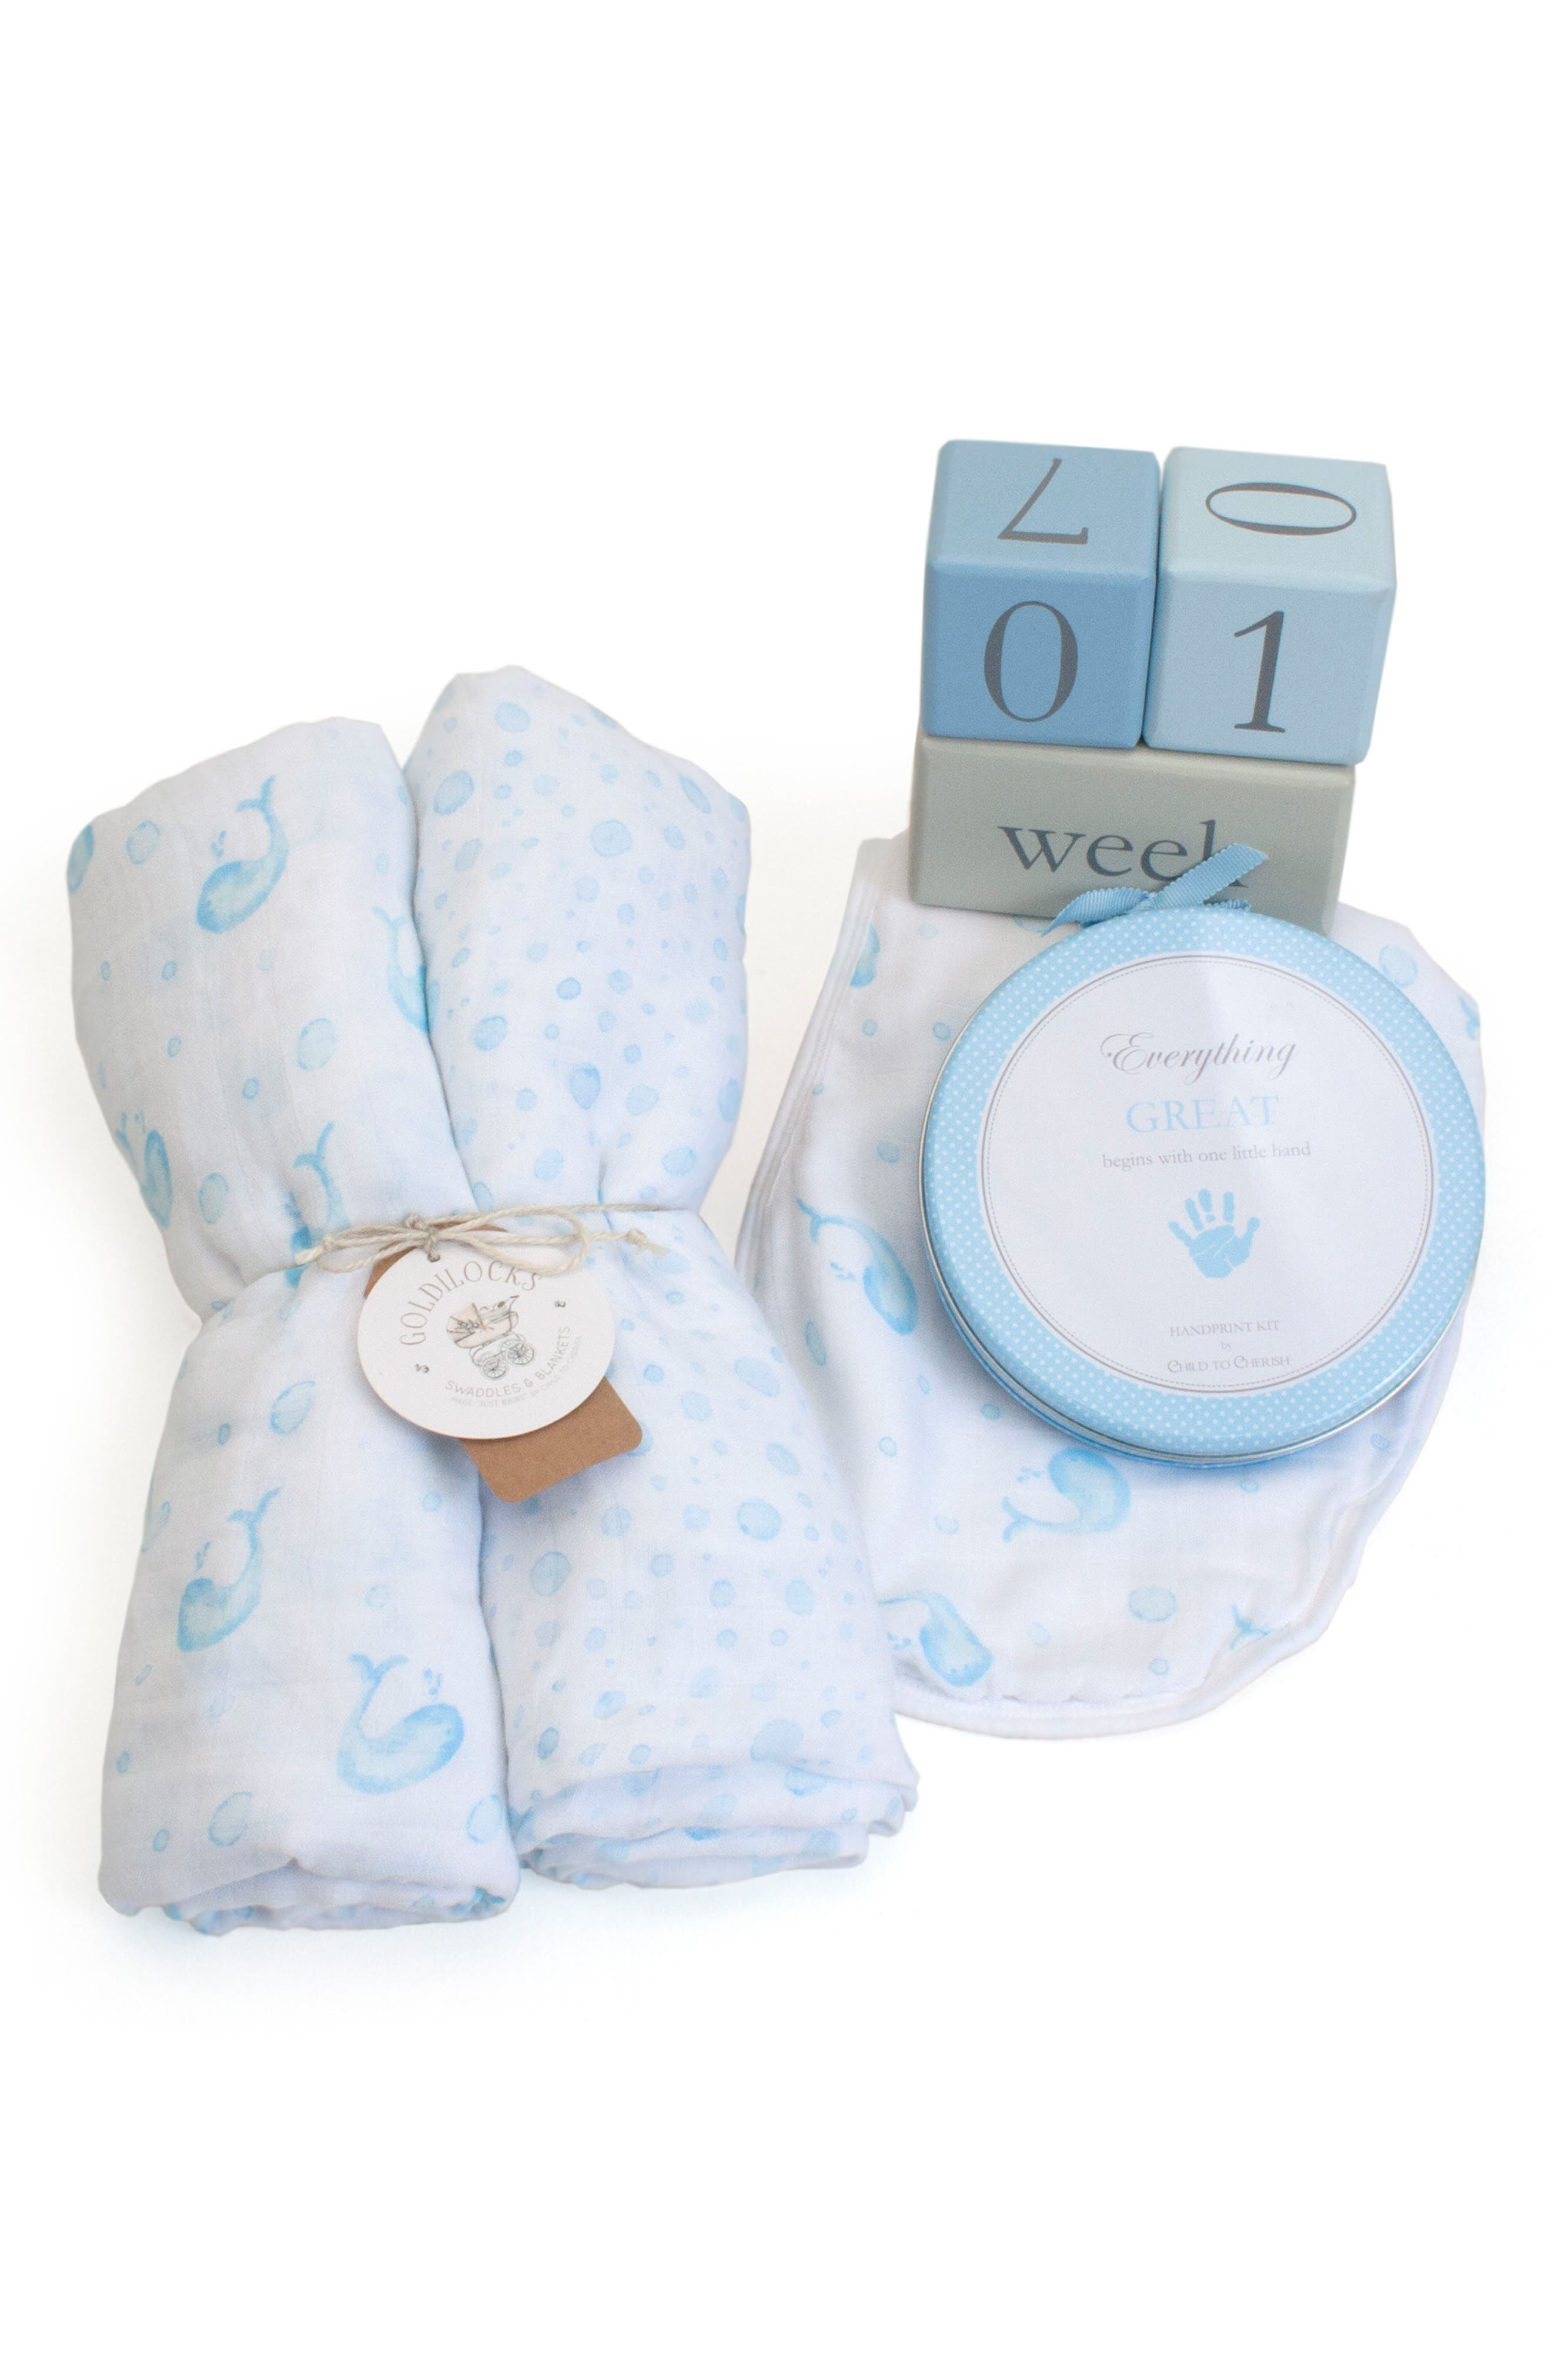 CHILD TO CHERISH Bubbles & Whales Goldilocks Swaddle, Handprint & Photo Block Gift Set, Main, color, 450